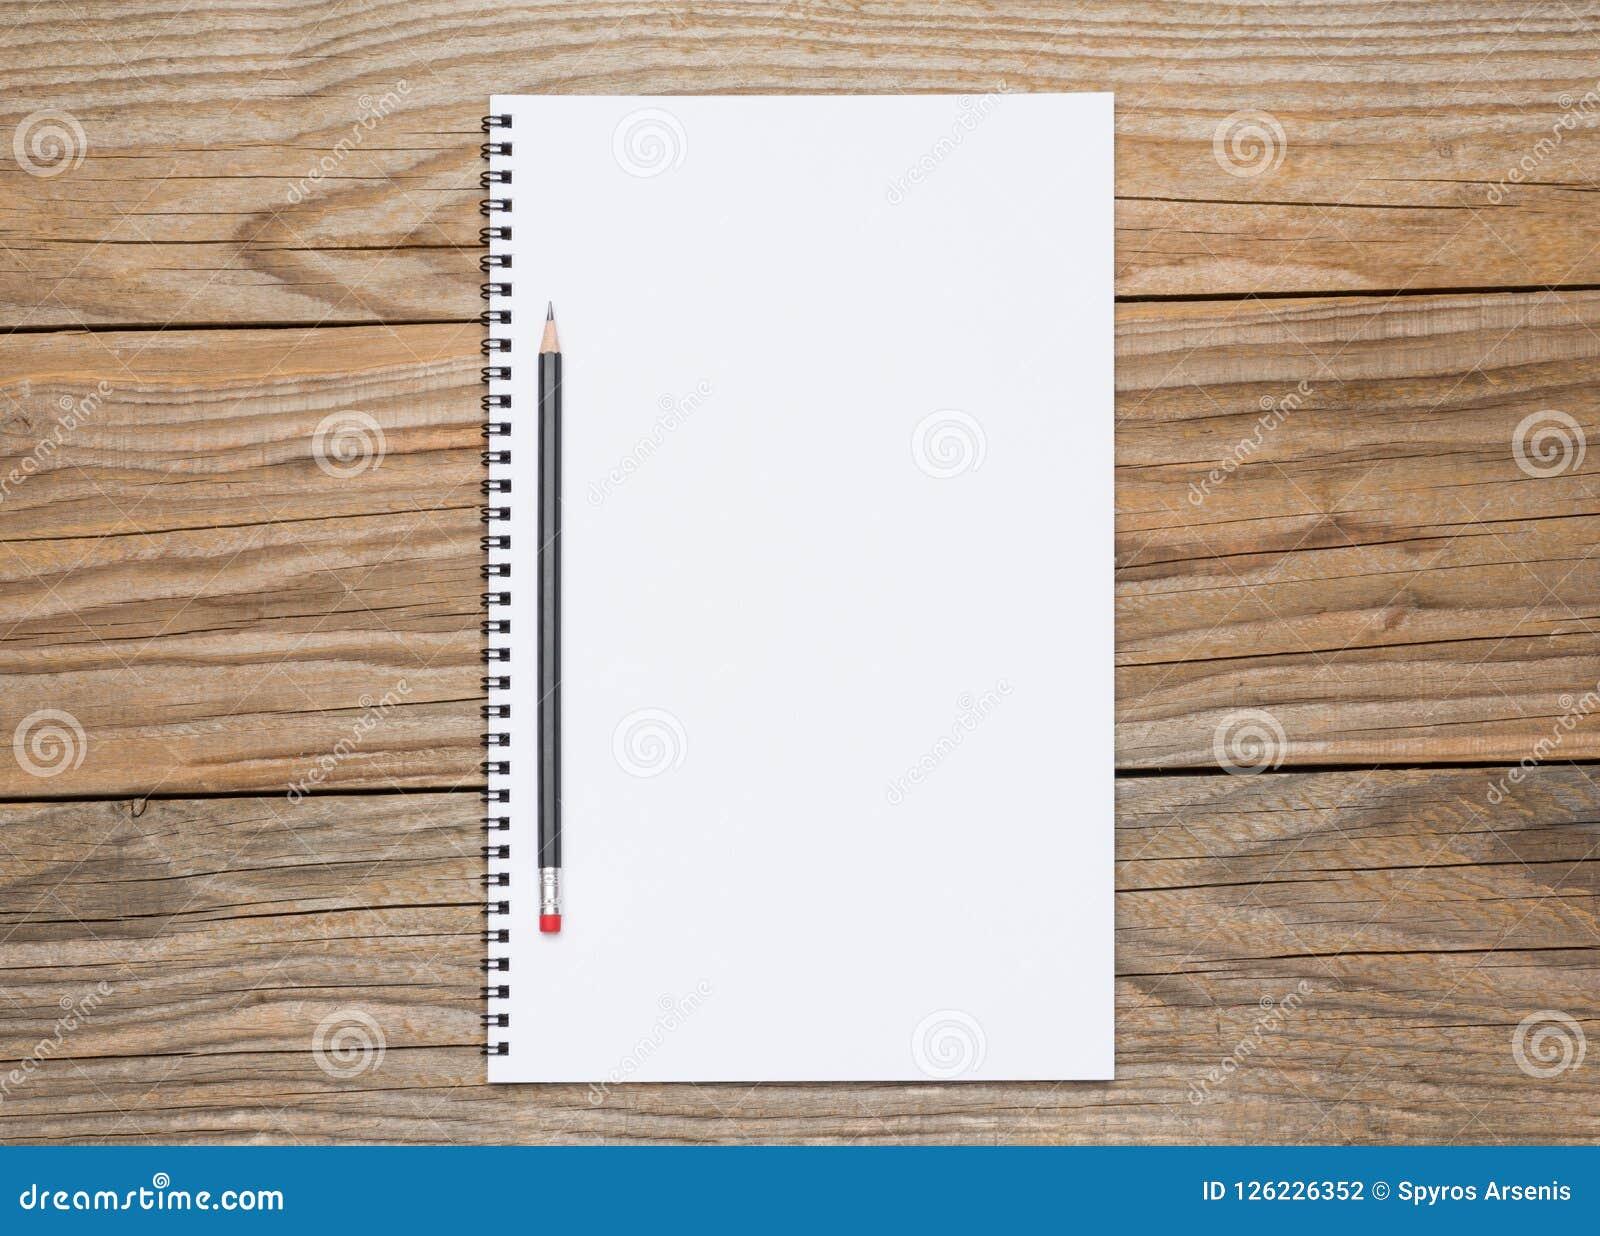 Pagina in bianco di uno sketchbook con una matita nera